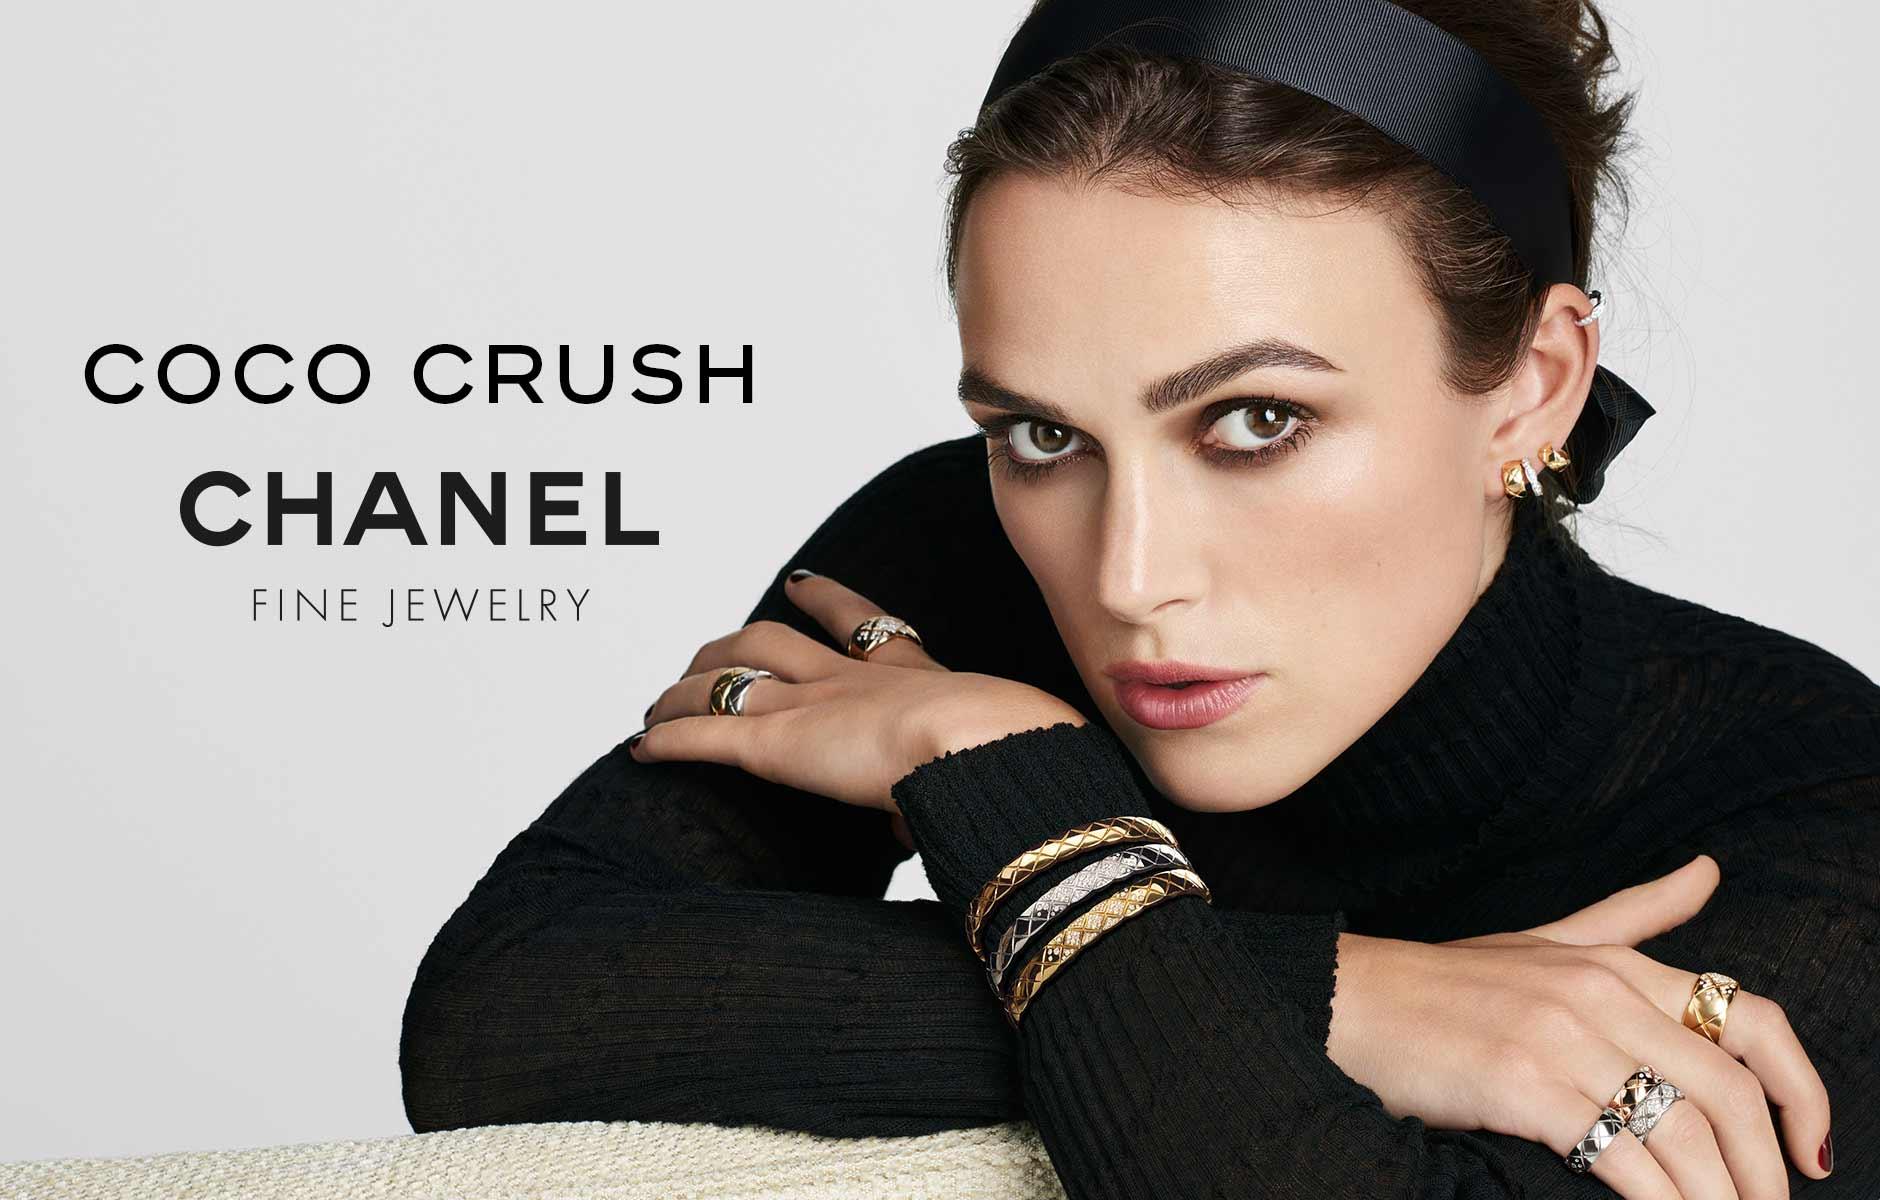 Keira Knightley Chanel Coco Crush